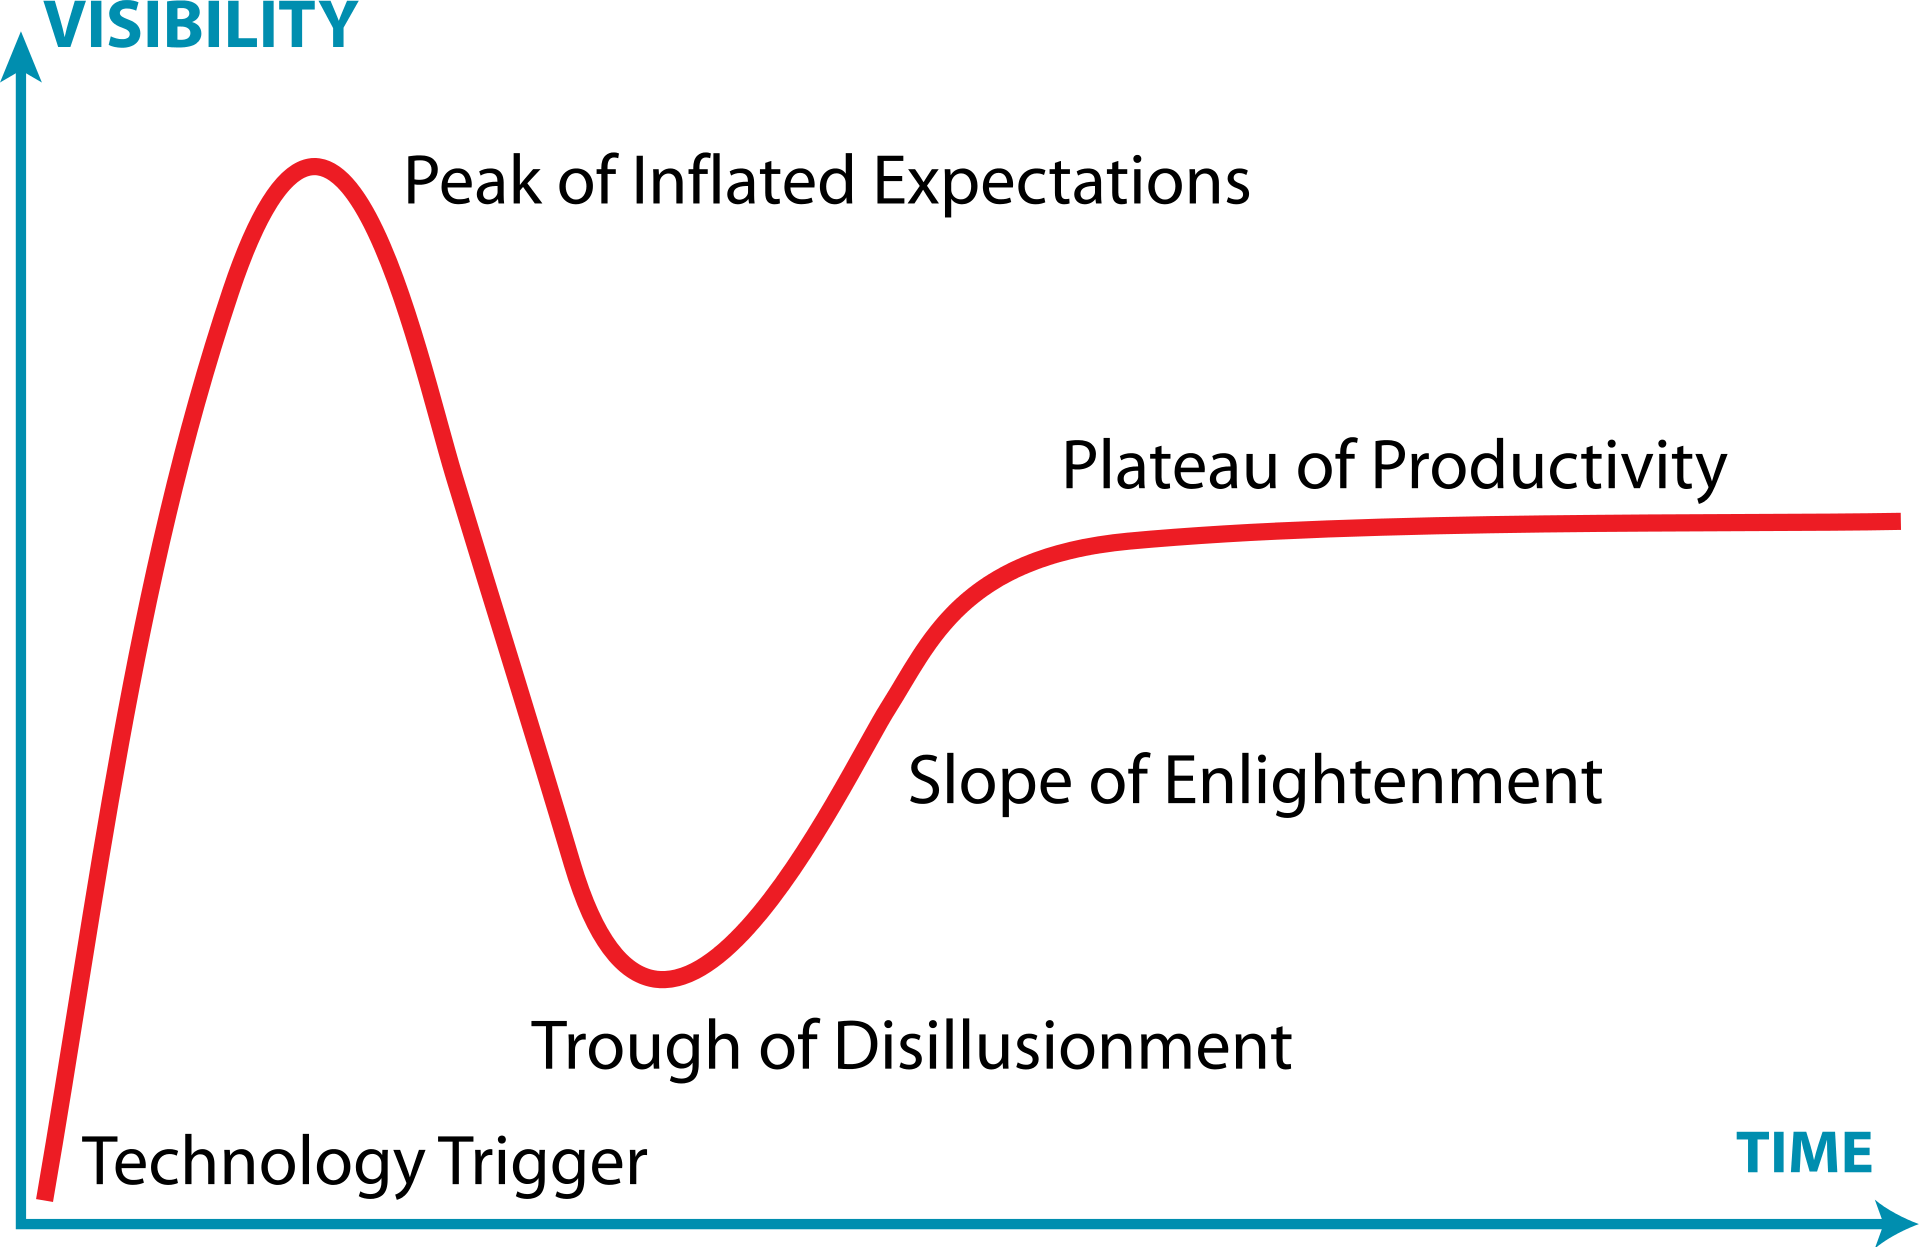 Gartner Hype Cycle graph